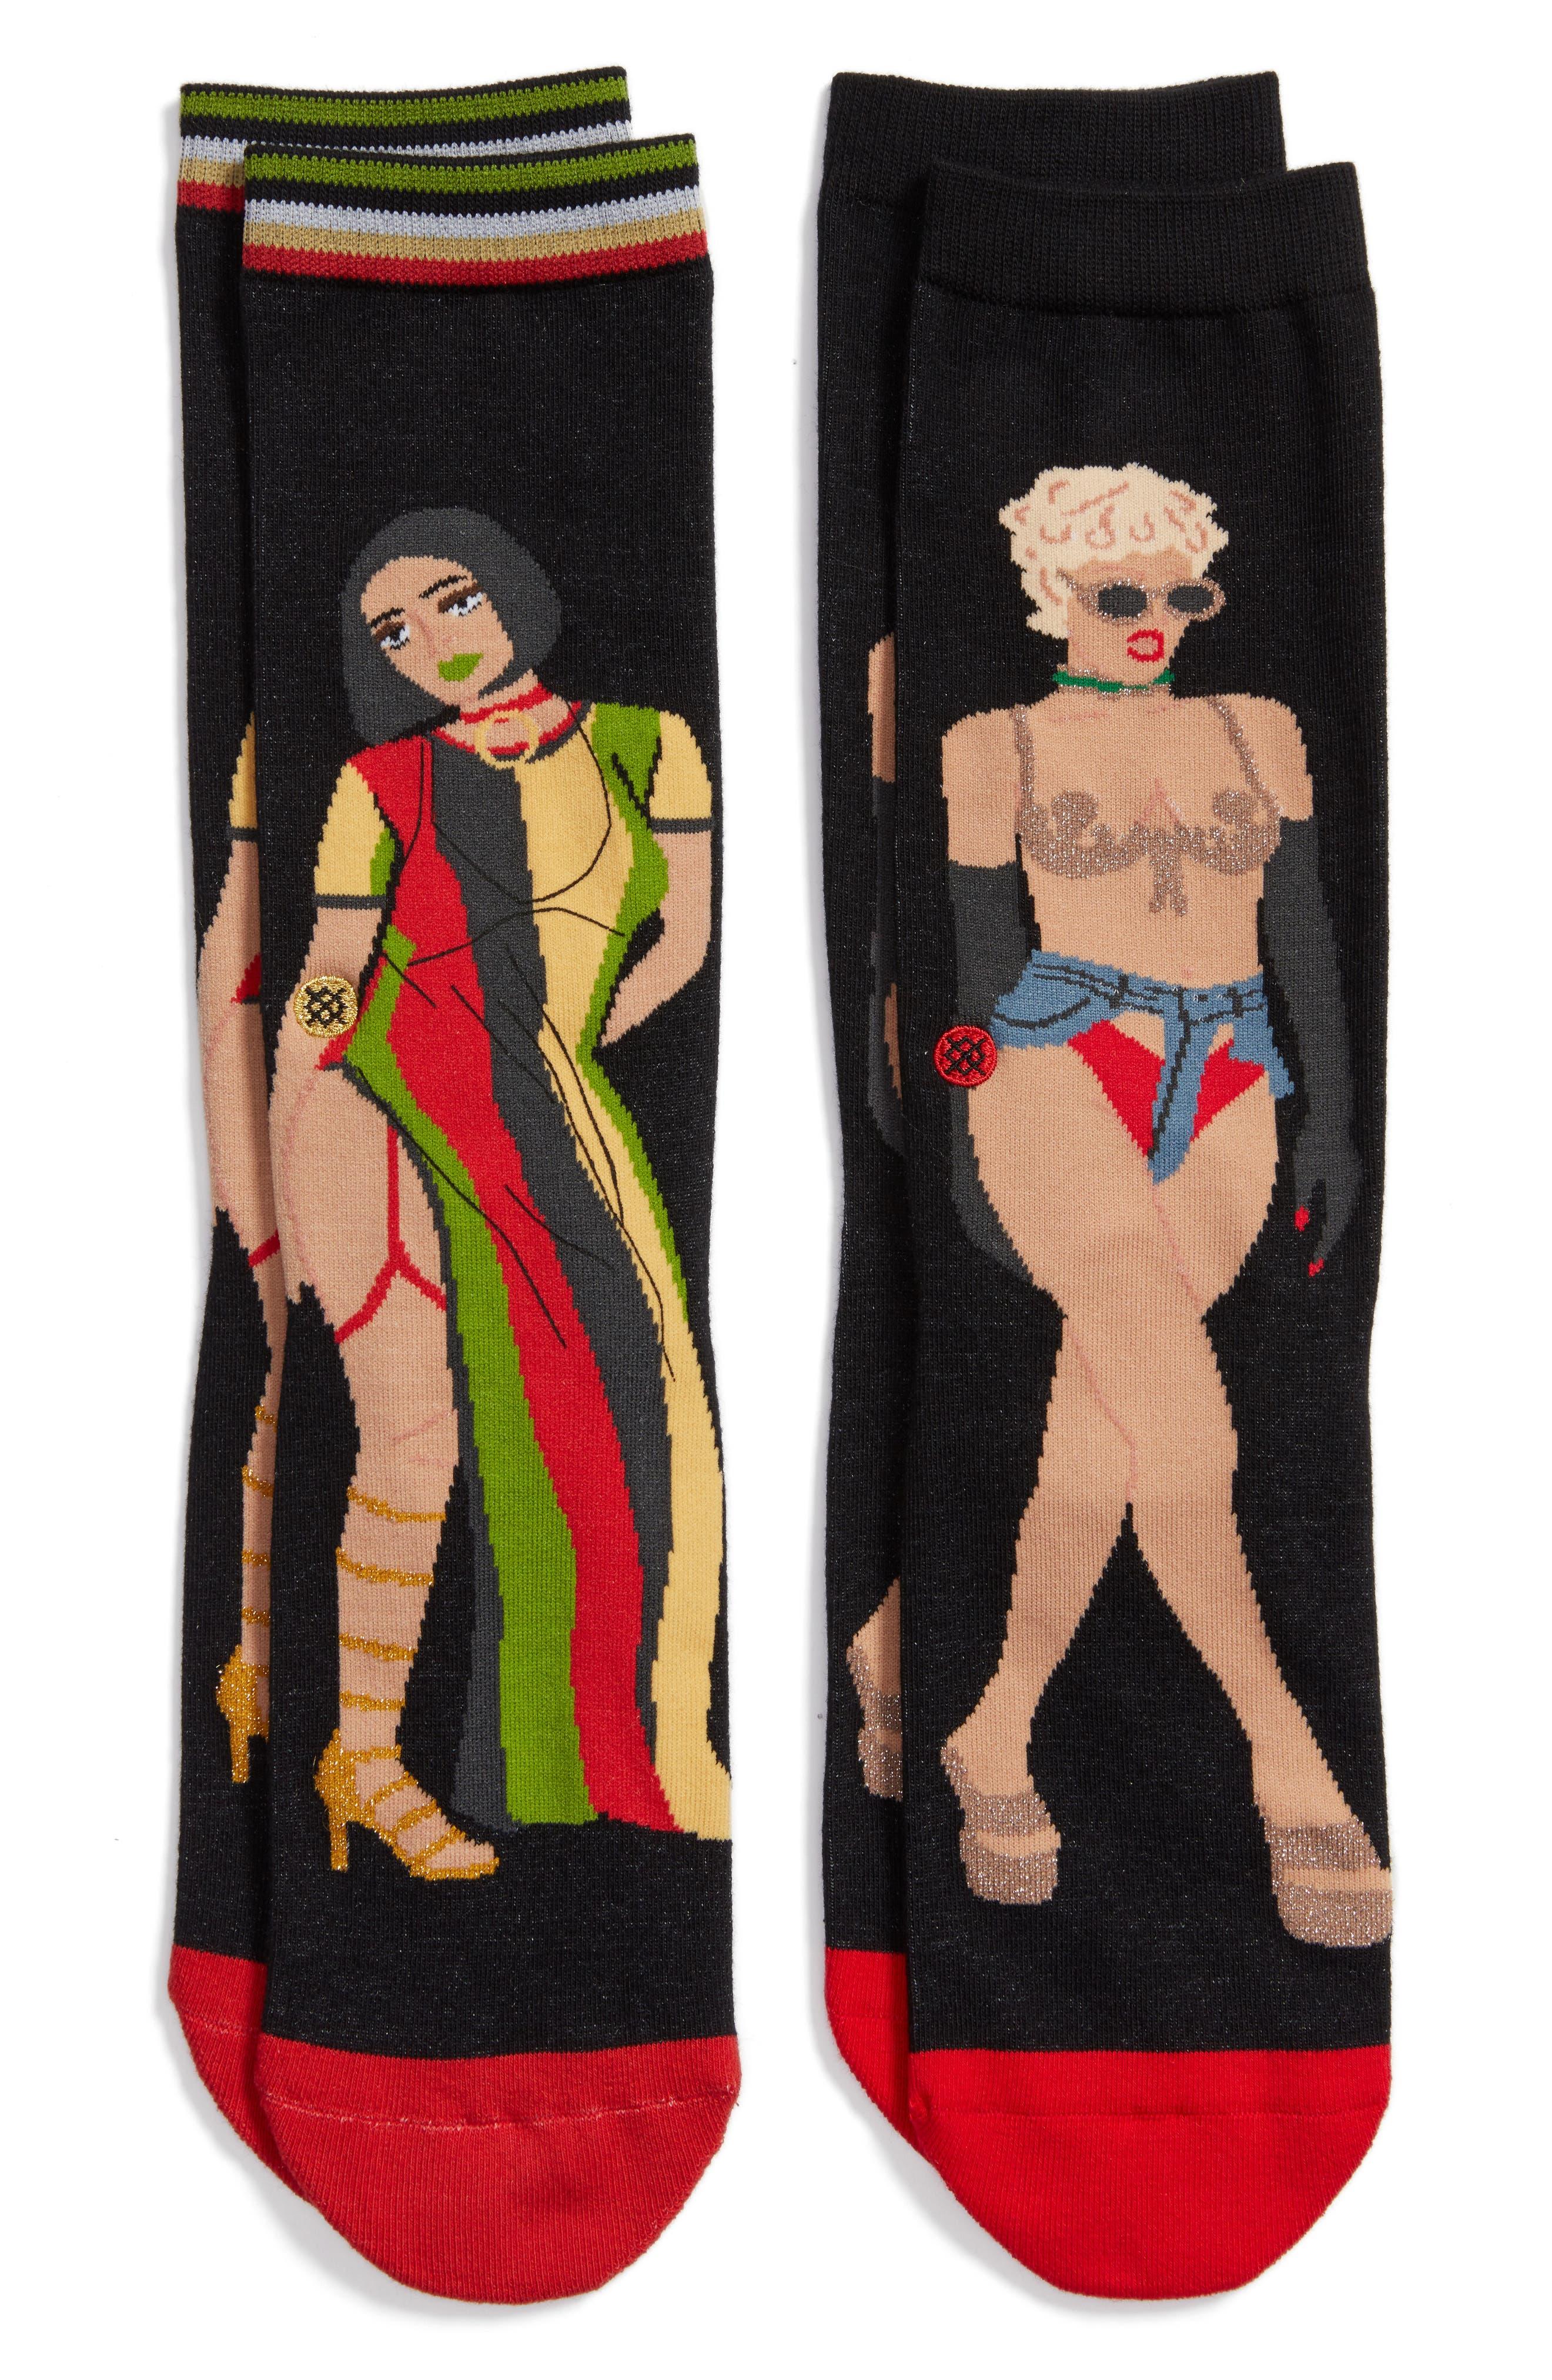 Alternate Image 1 Selected - Stance x Rihanna Music Video Crew Socks